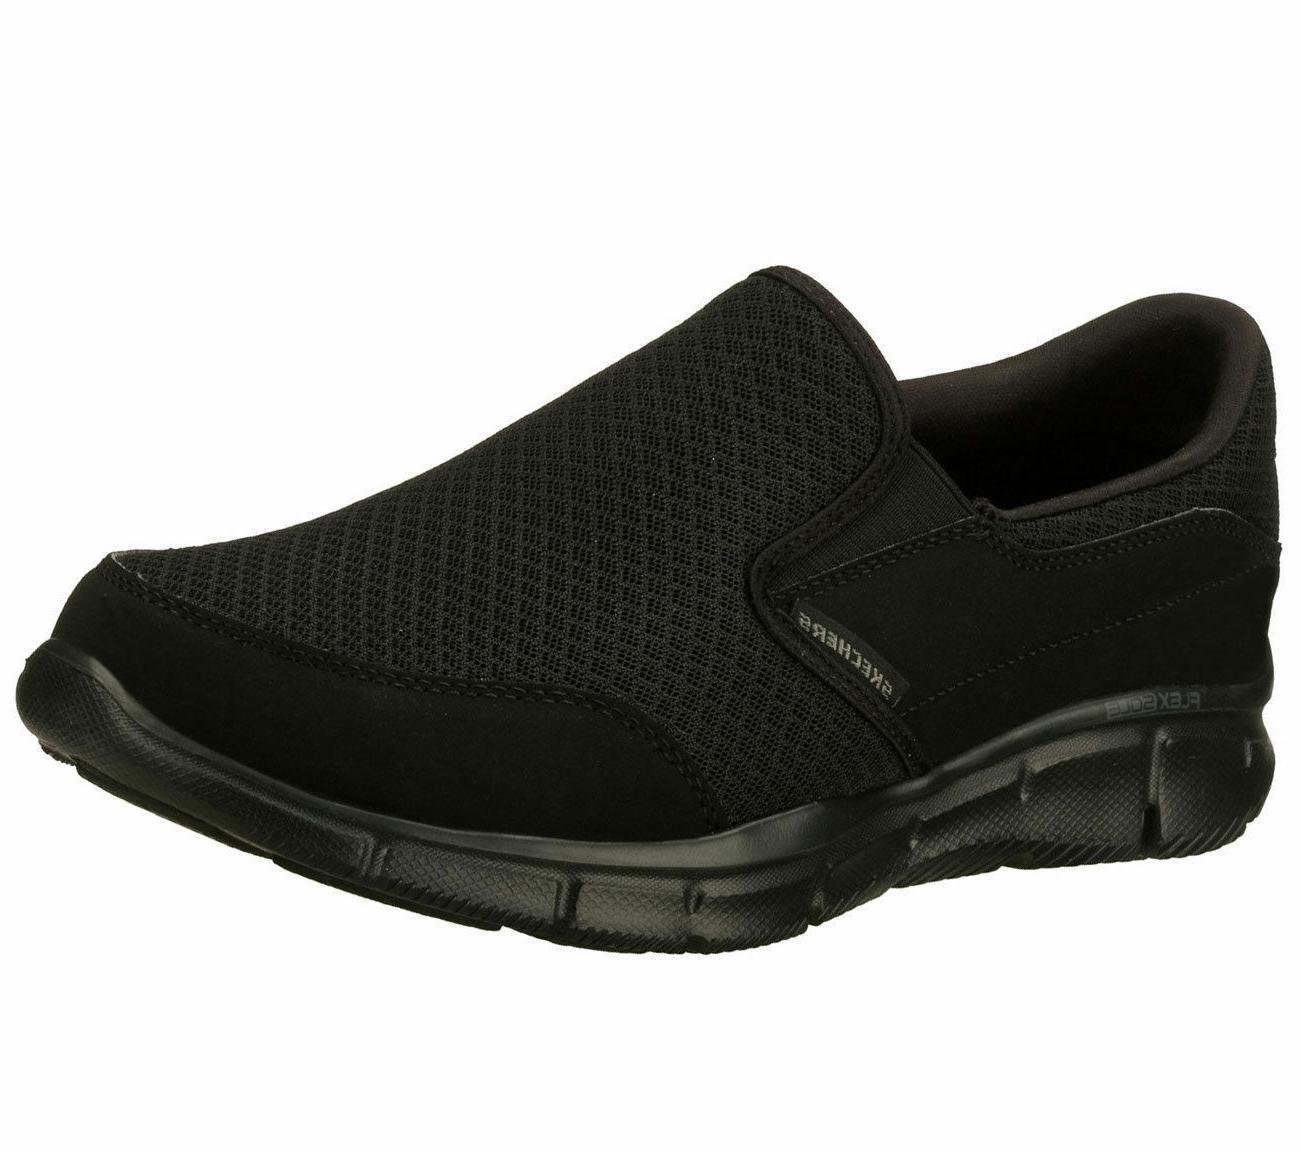 memory foam black shoes men s 51361